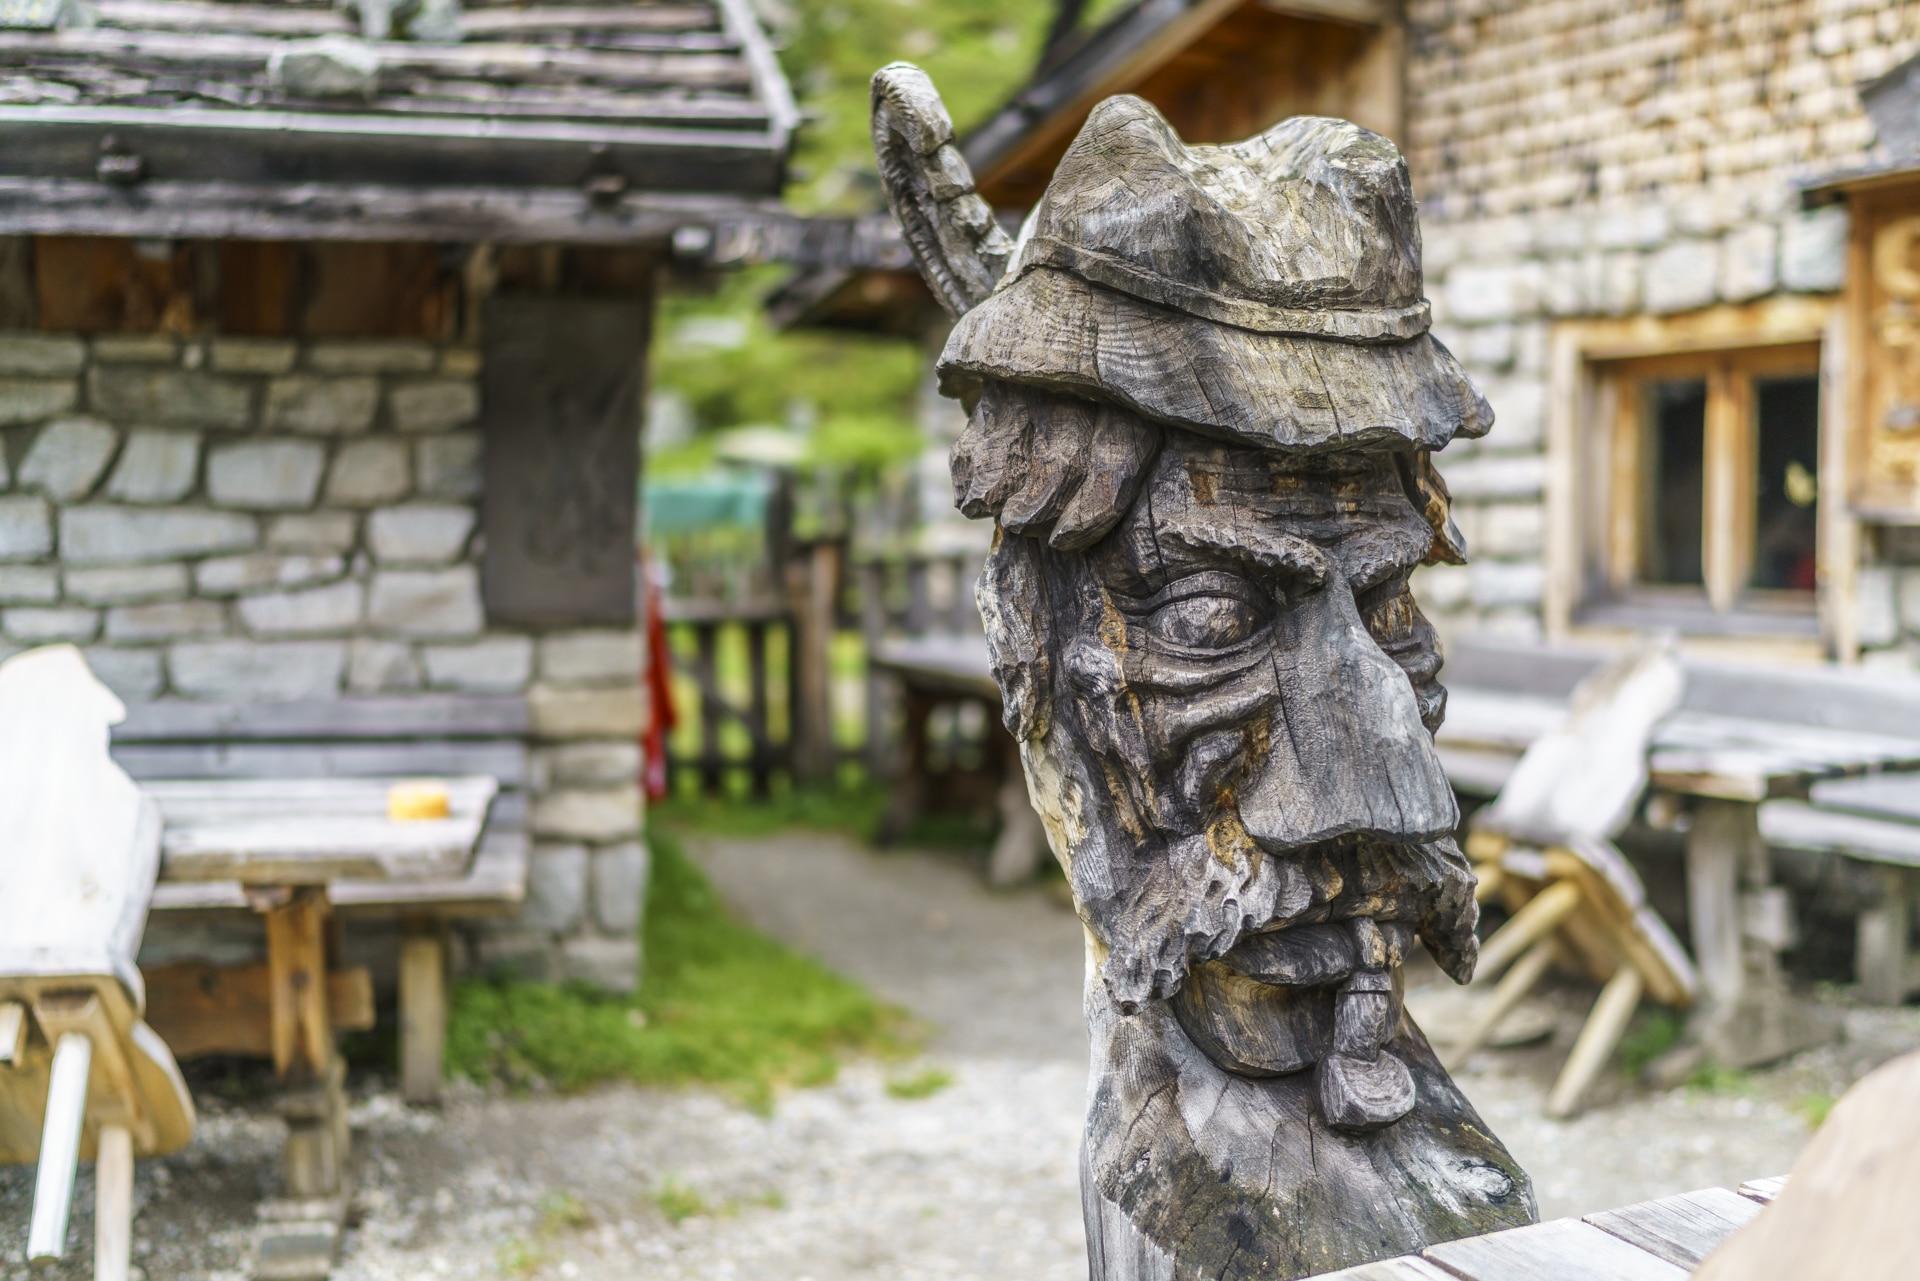 Holzschnitzerei-Sulzenaualm